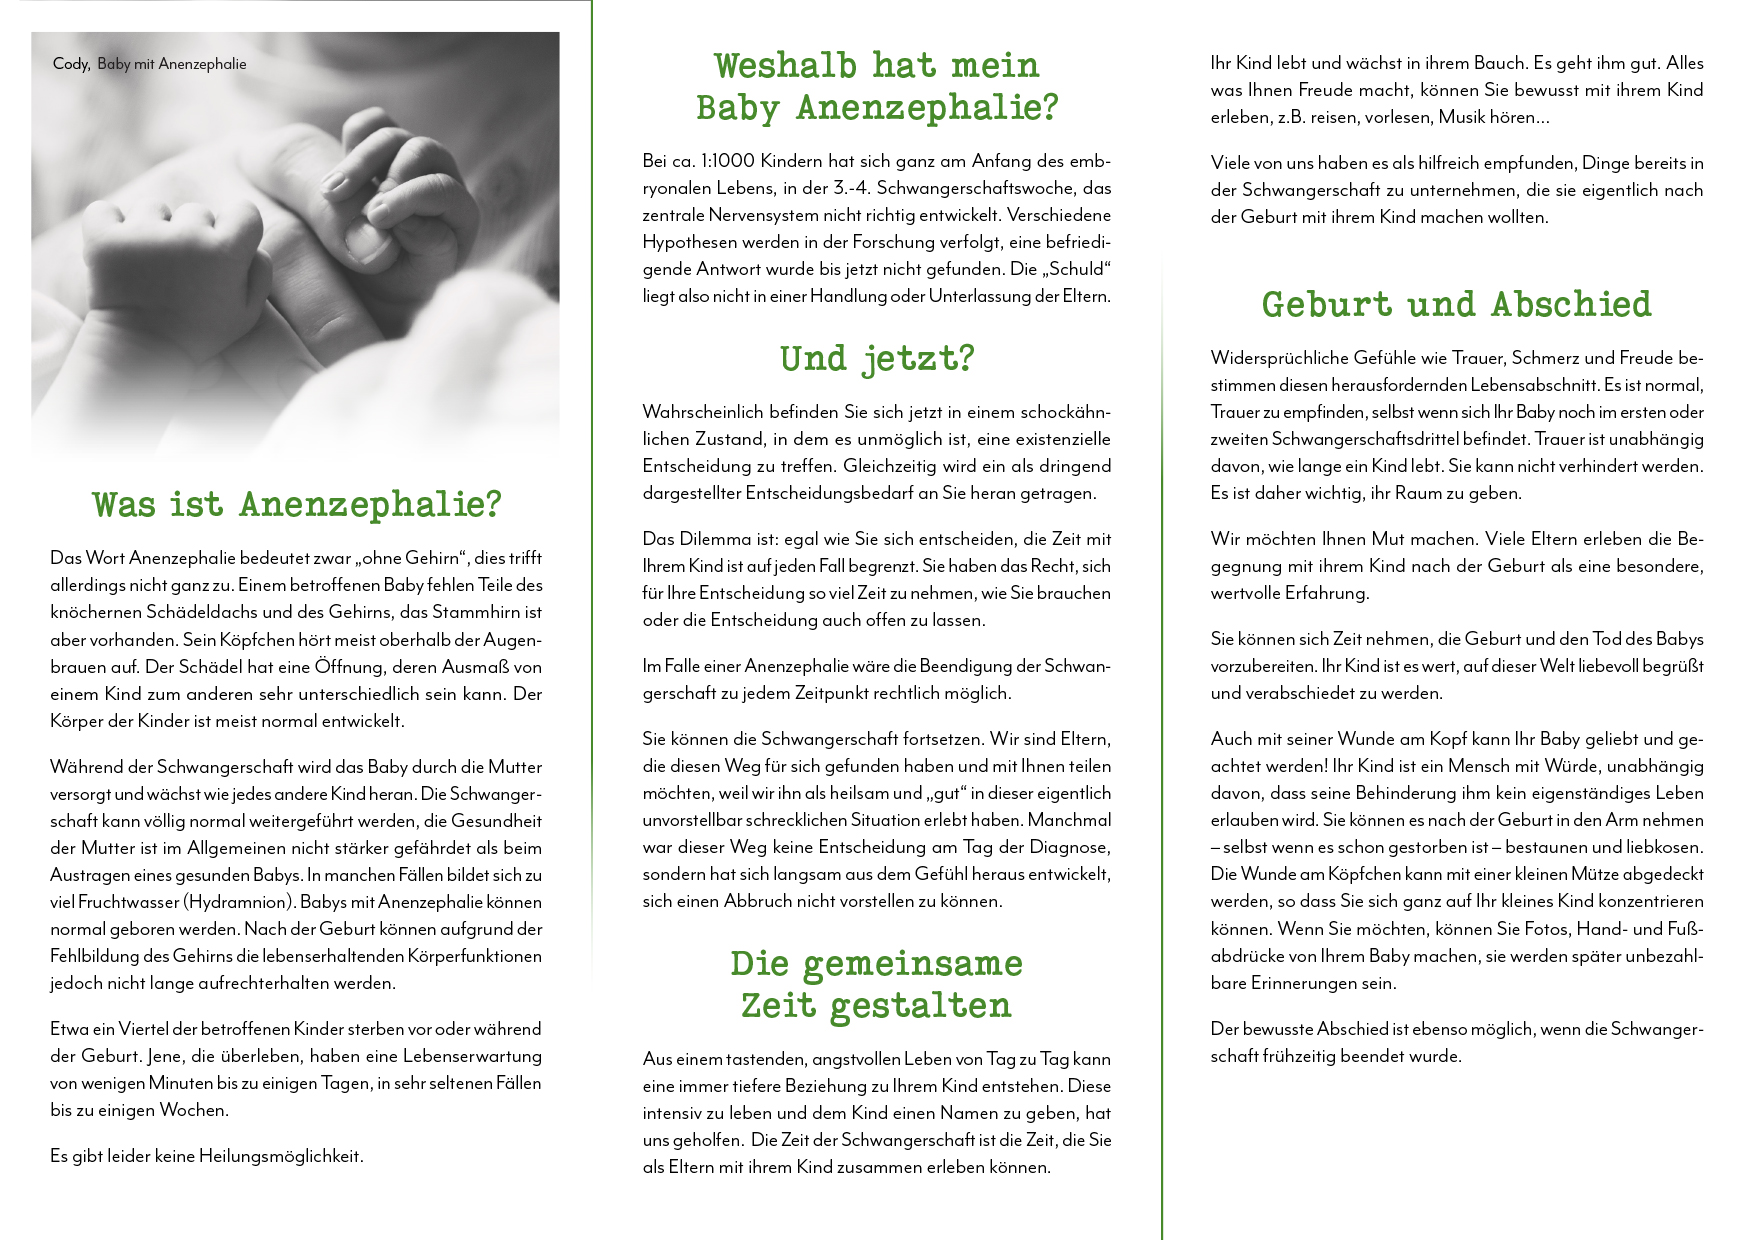 Anencephaly Brochure - DEUTSCH-2.jpg